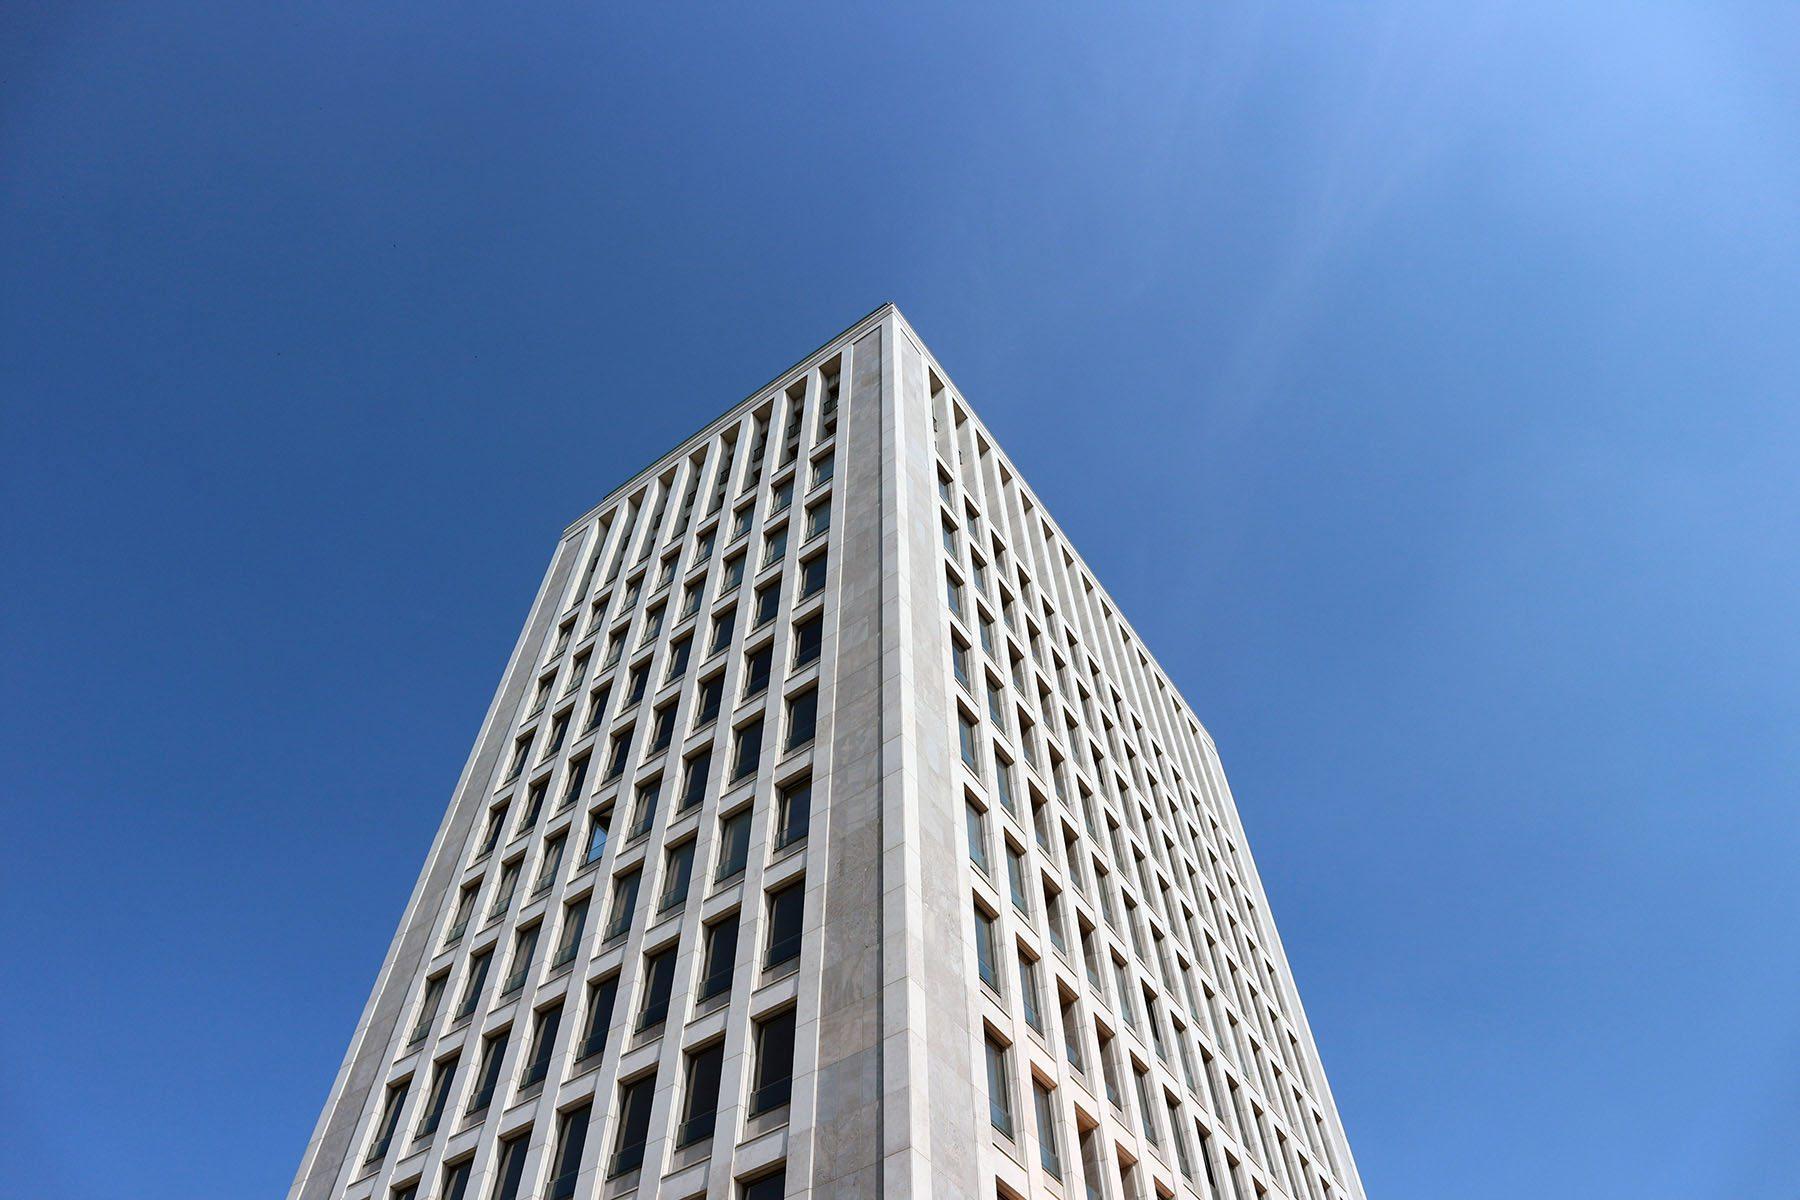 Gerlingviertel. Der 55 Meter hohe Turm im Gerling-Quartier